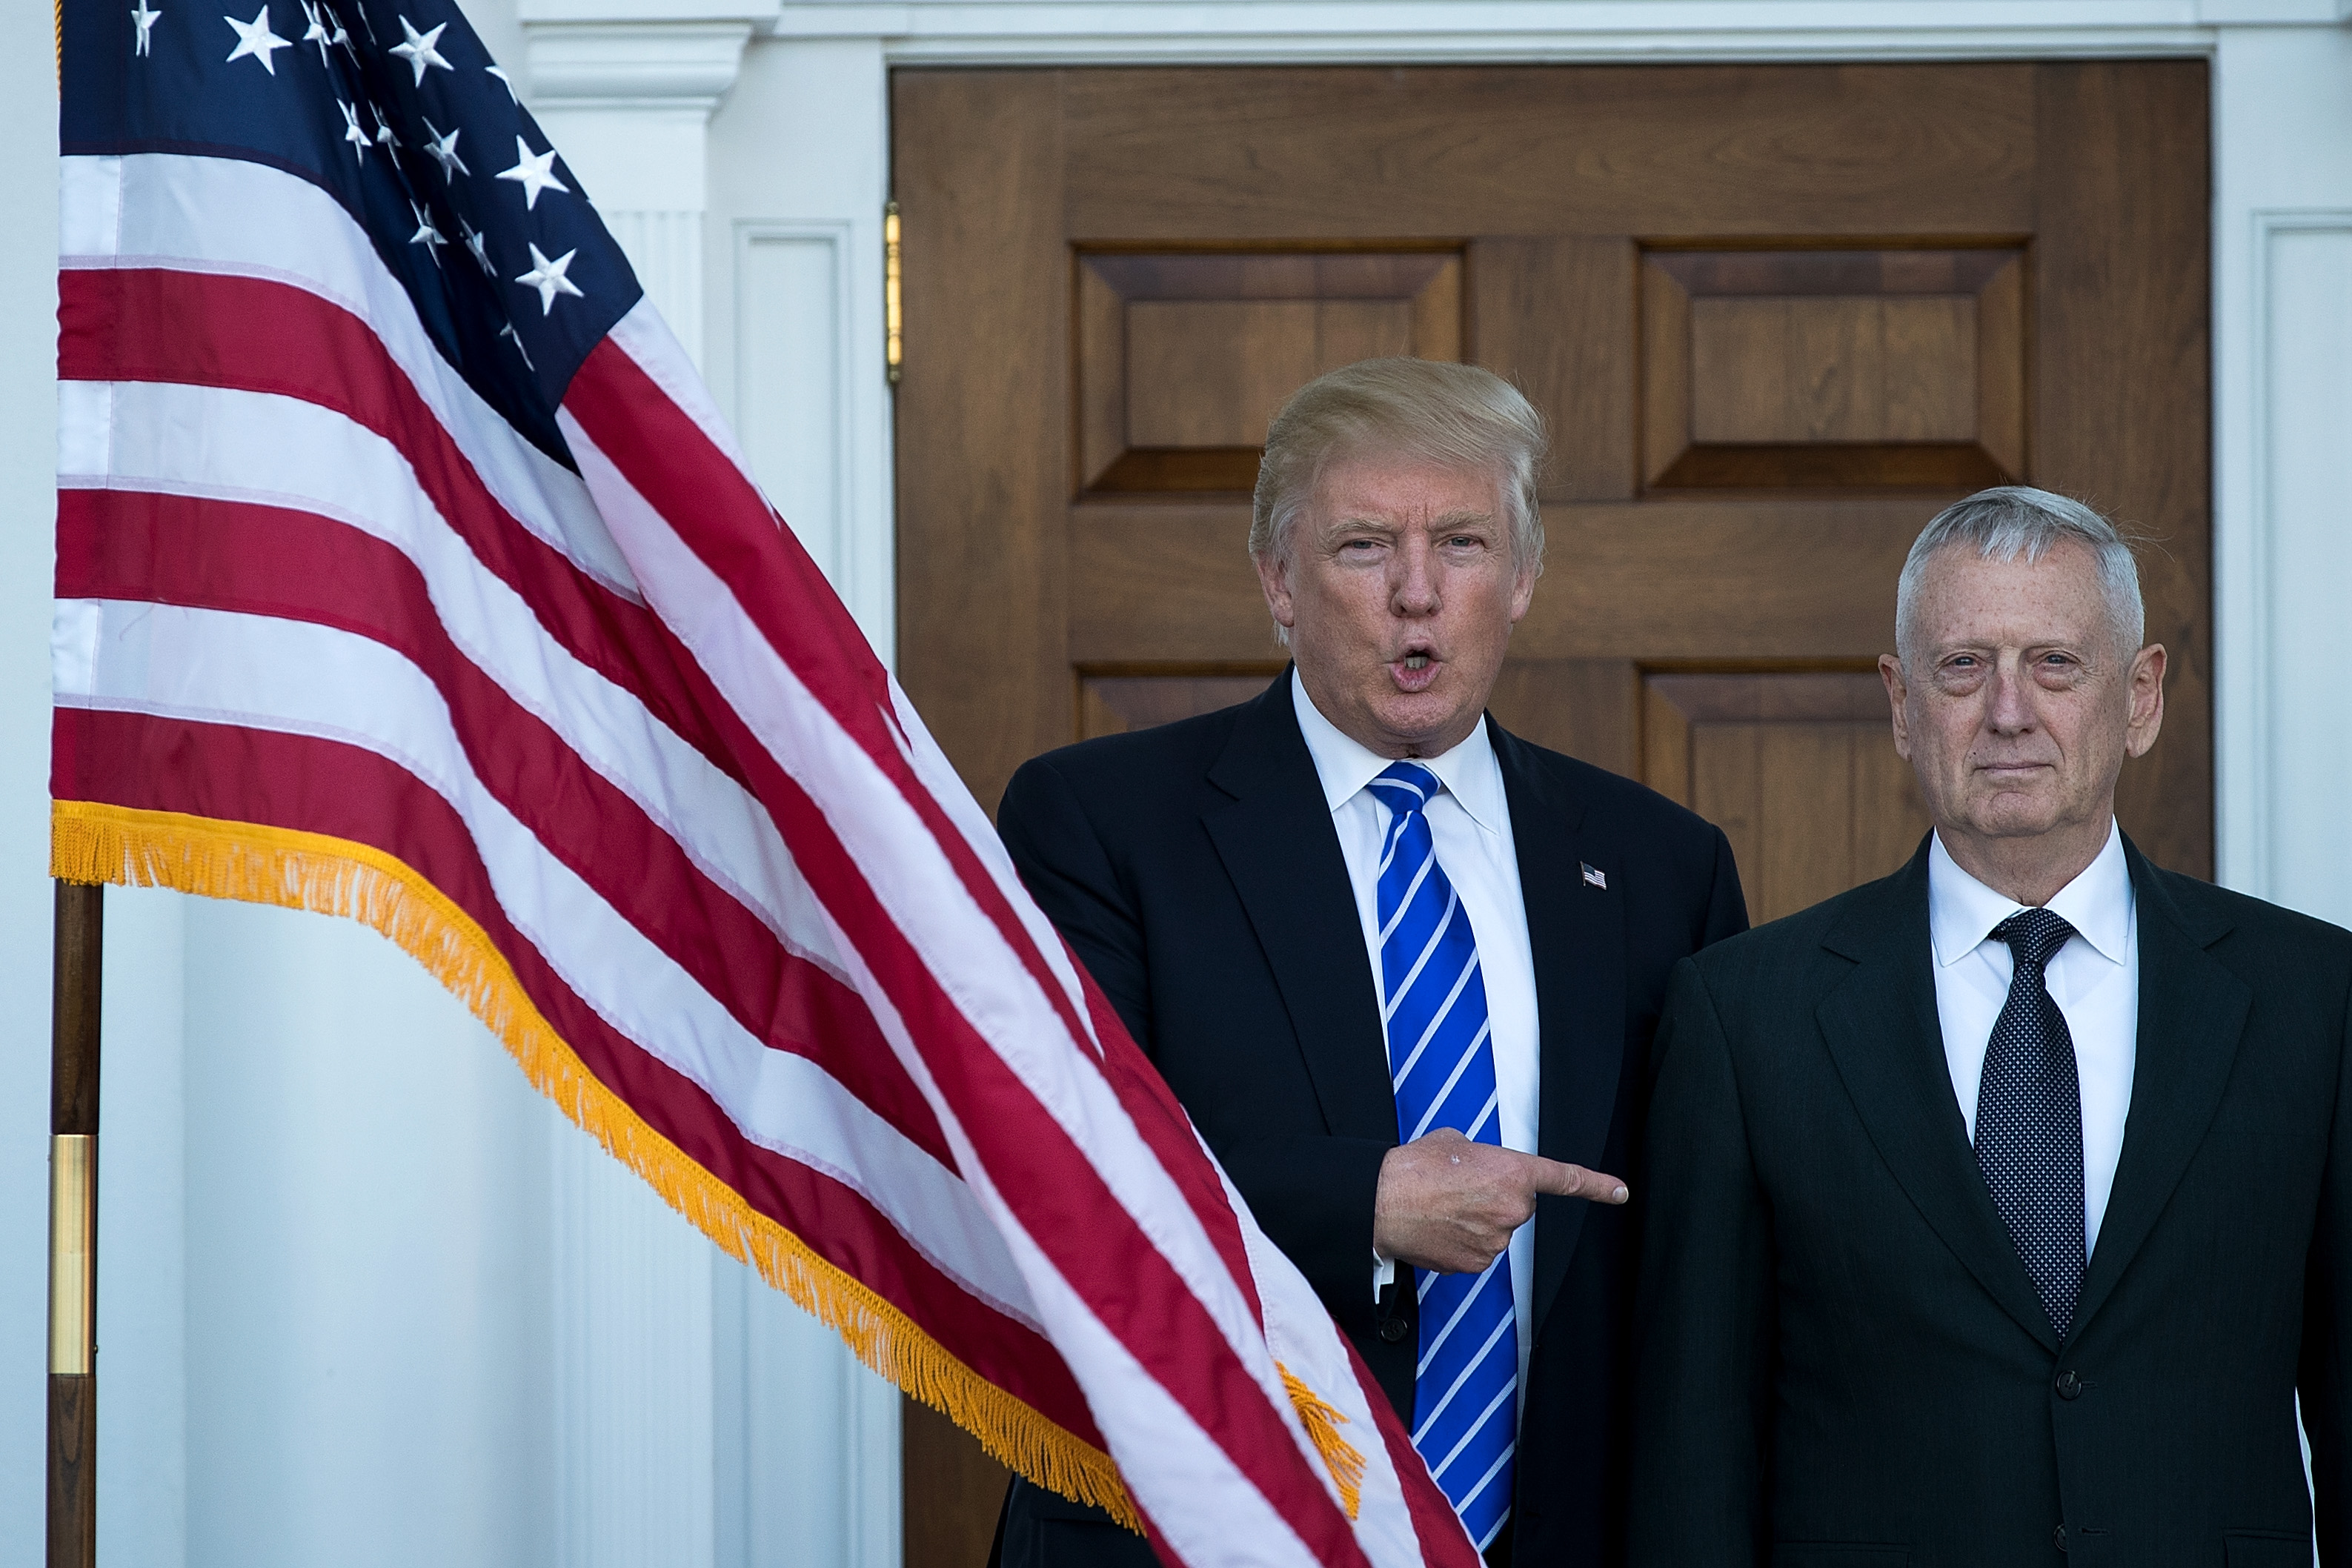 Donald Trump and General mattis